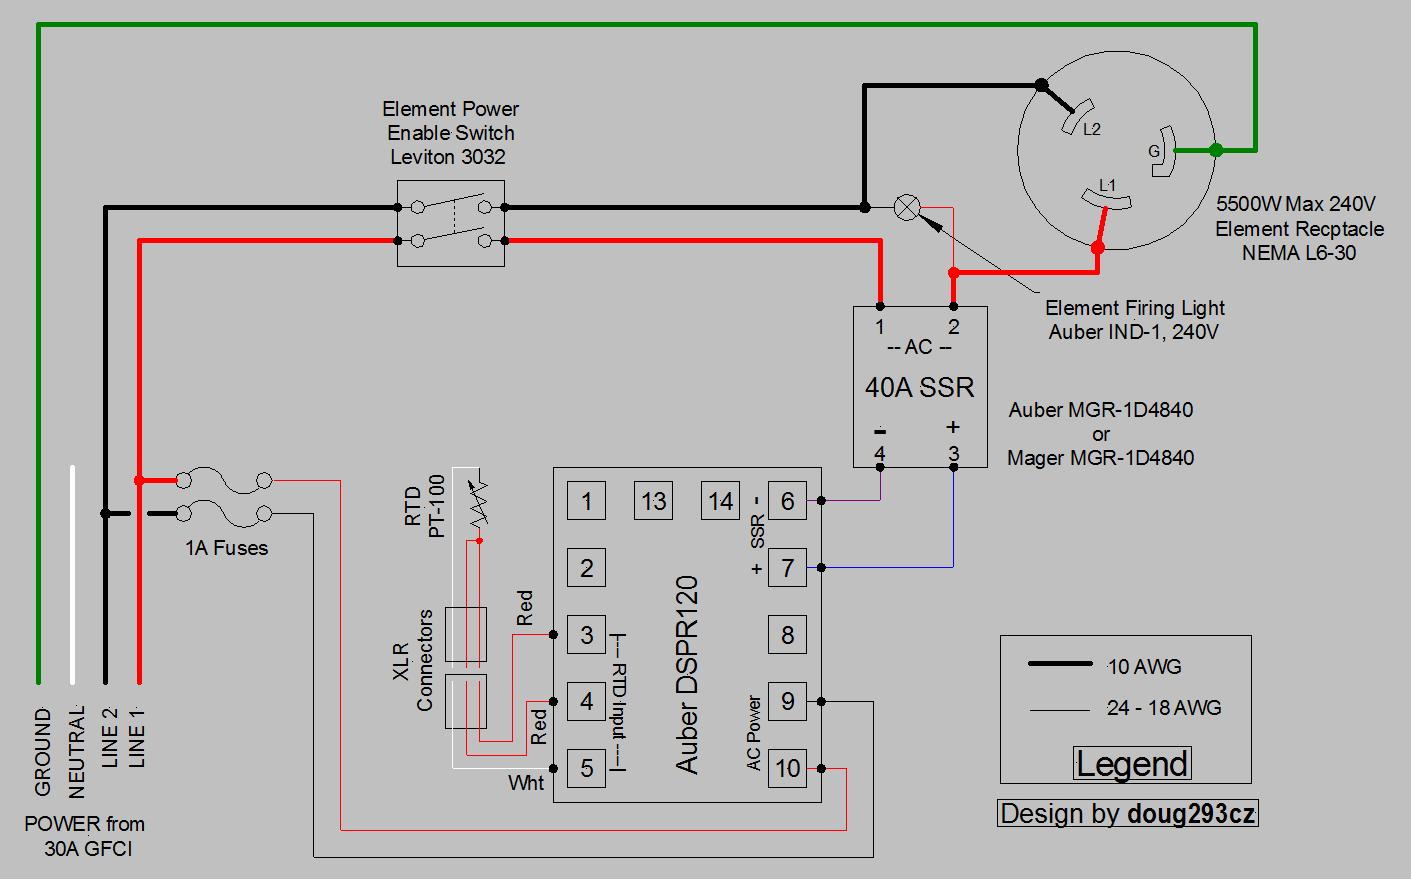 control power on 2250 watt 120v element homebrewtalk com beerdspr120 1 element 240v only png